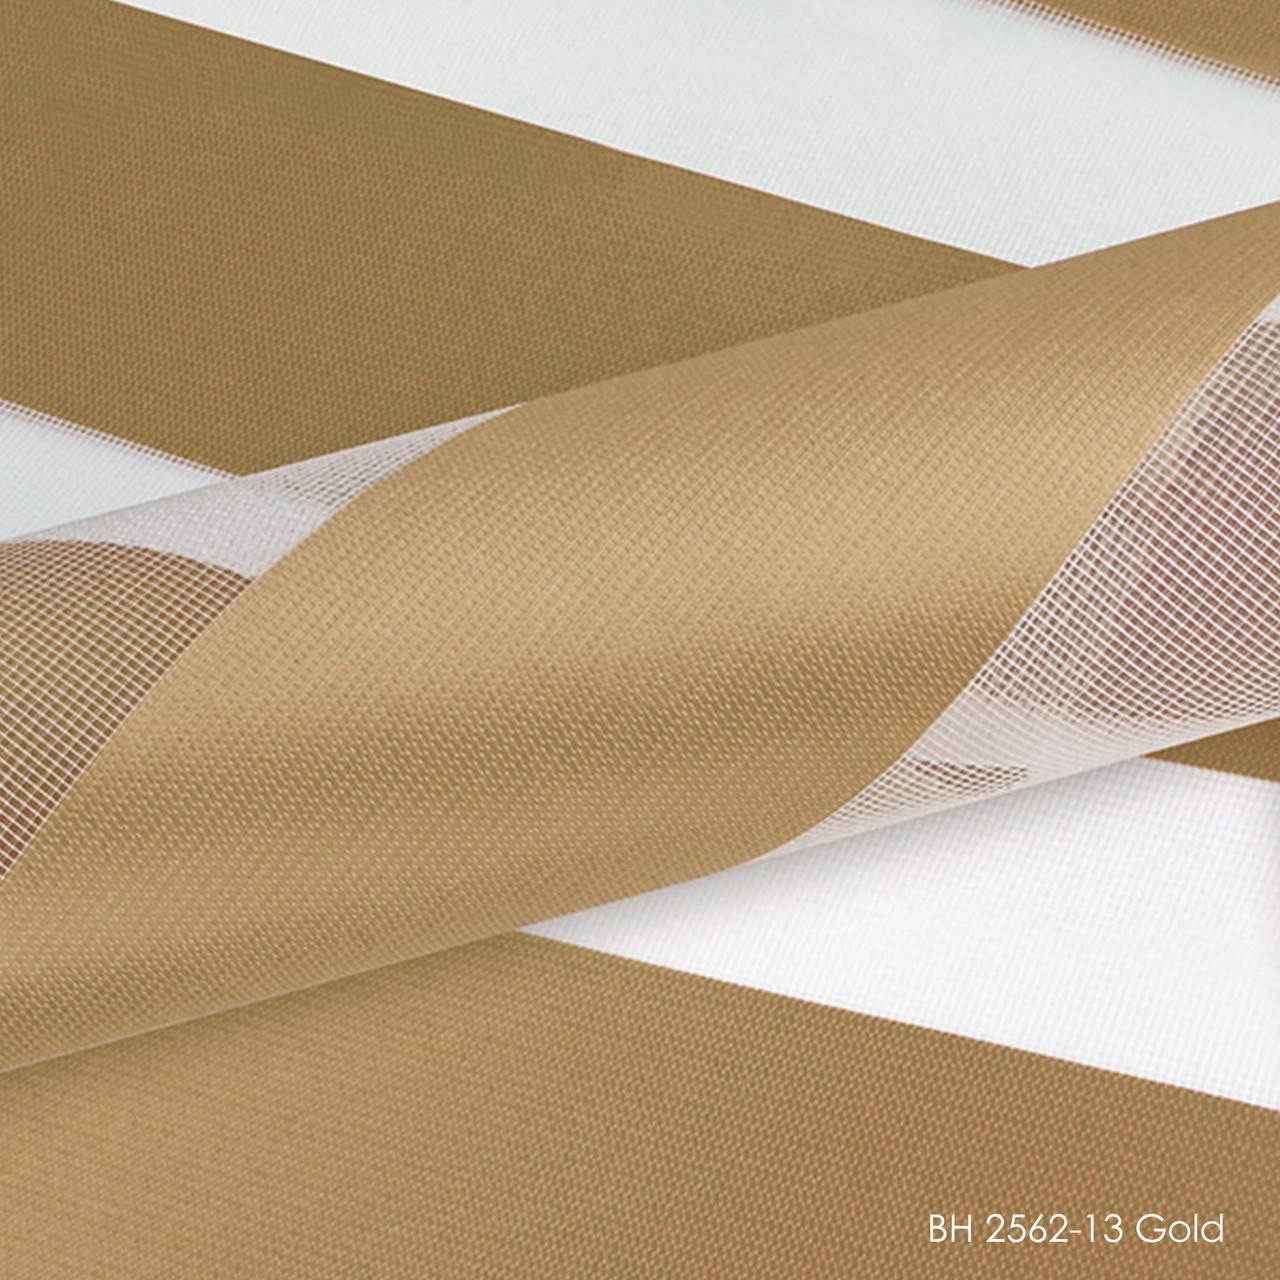 BH 2562-13 Gold